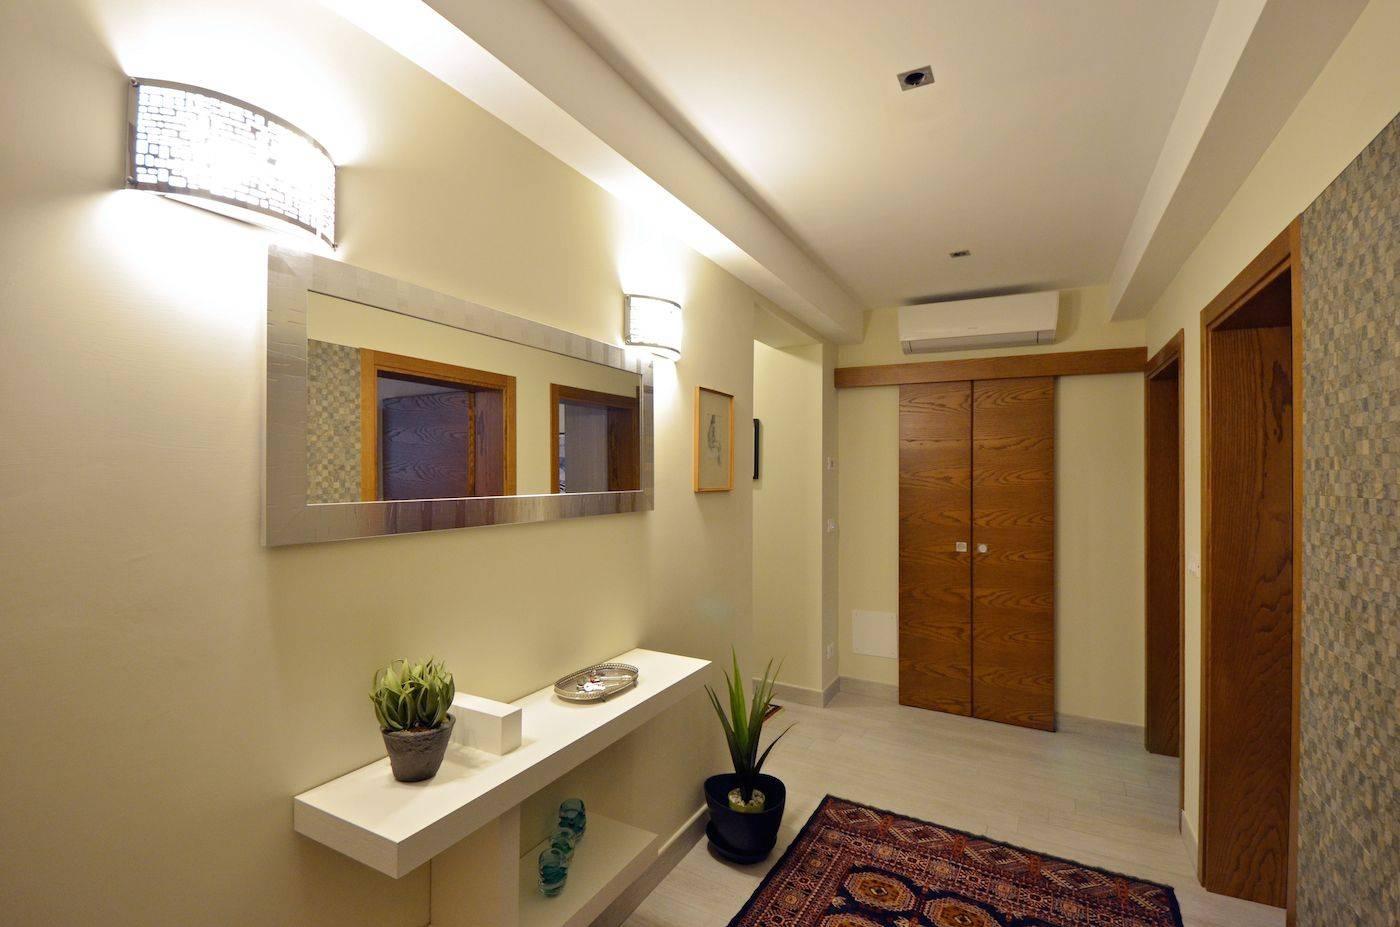 spacious entrance room